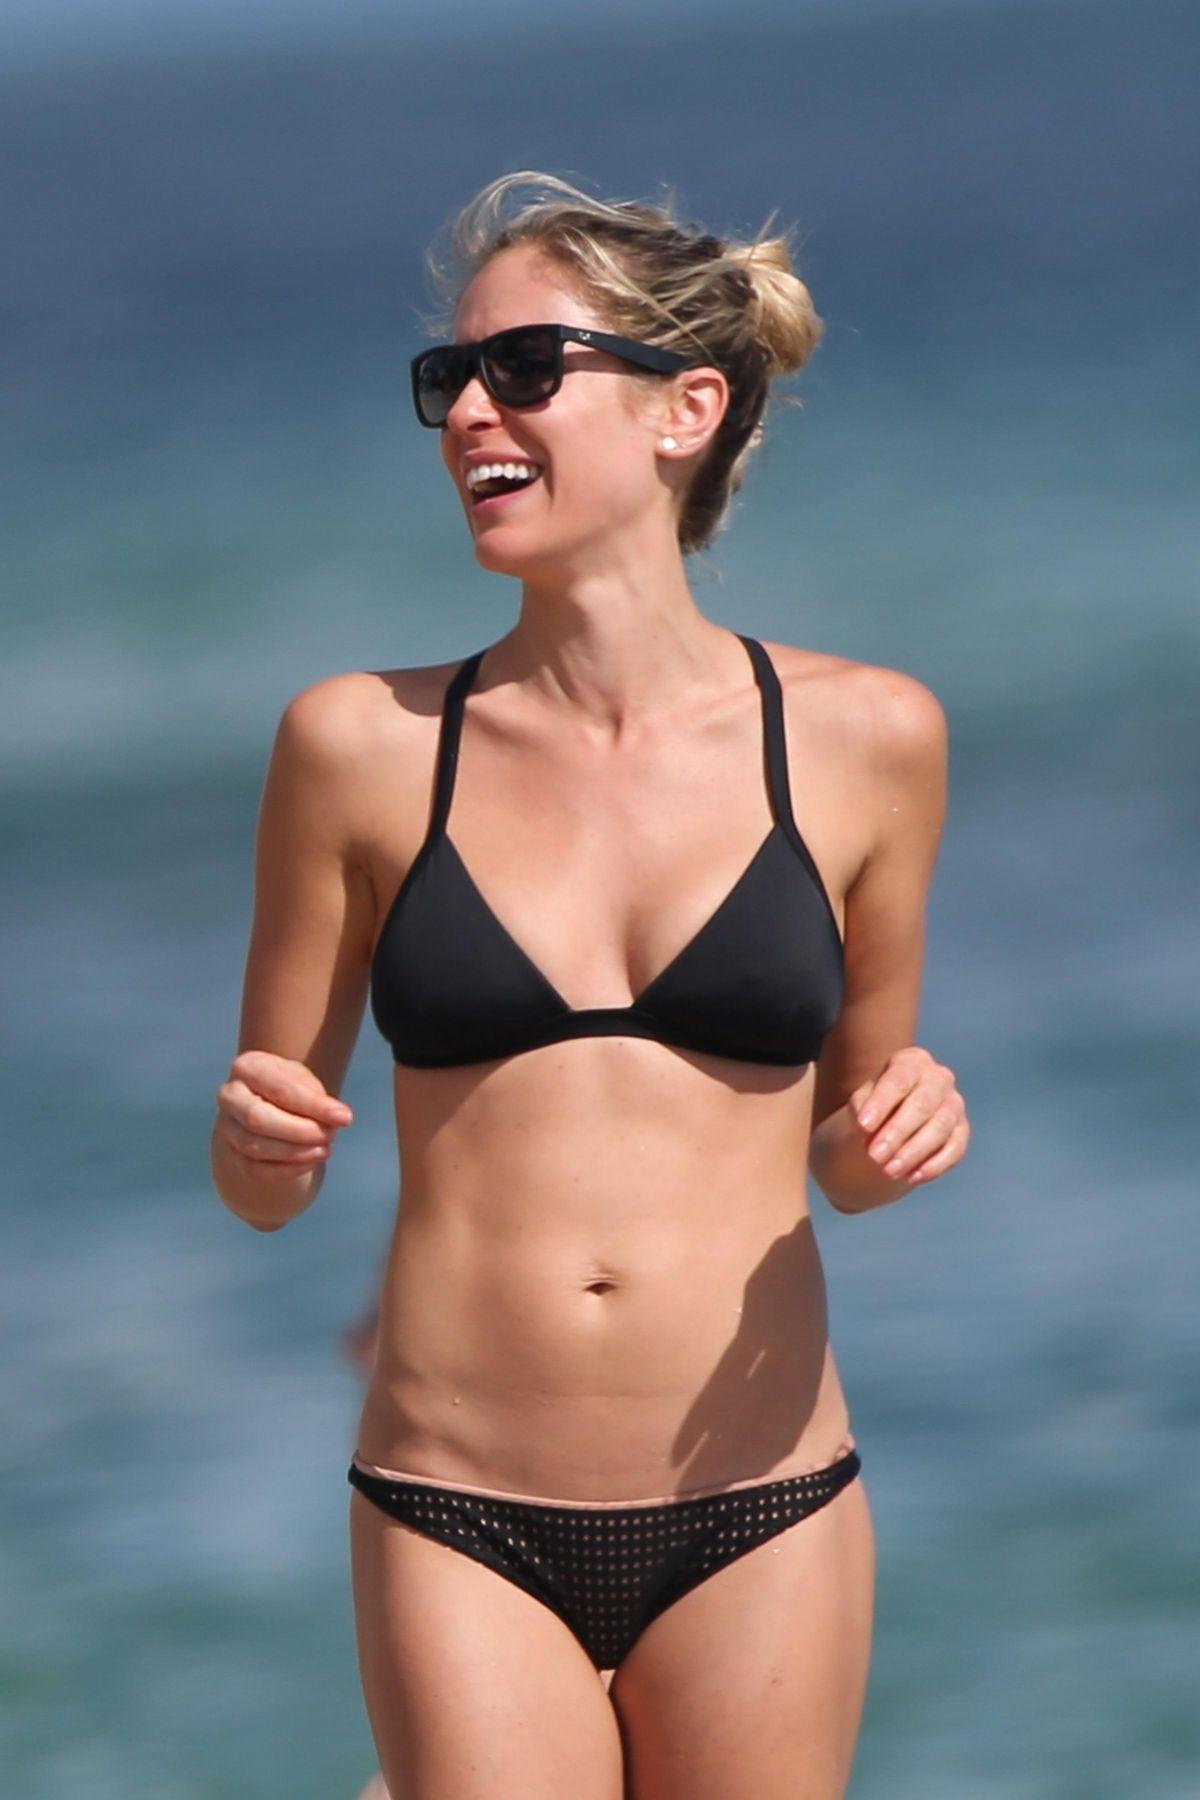 Bikini Kristin Cavallari naked (84 photo), Tits, Cleavage, Twitter, lingerie 2015